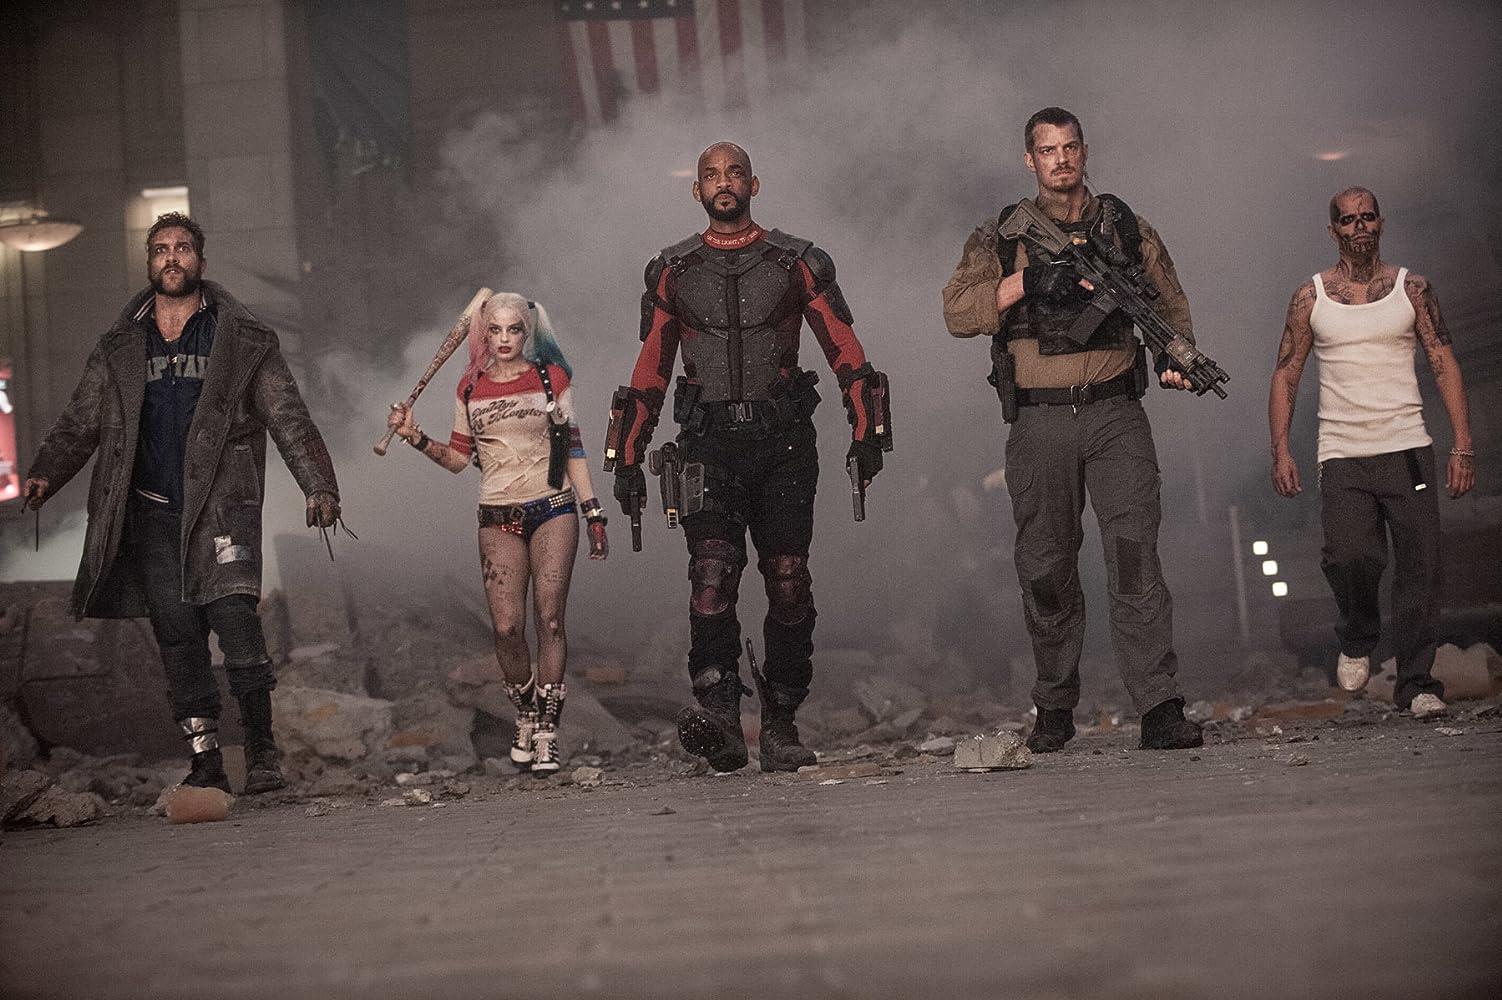 Will Smith, Jay Hernandez, Joel Kinnaman, Jai Courtney, and Margot Robbie in Suicide Squad (2016)